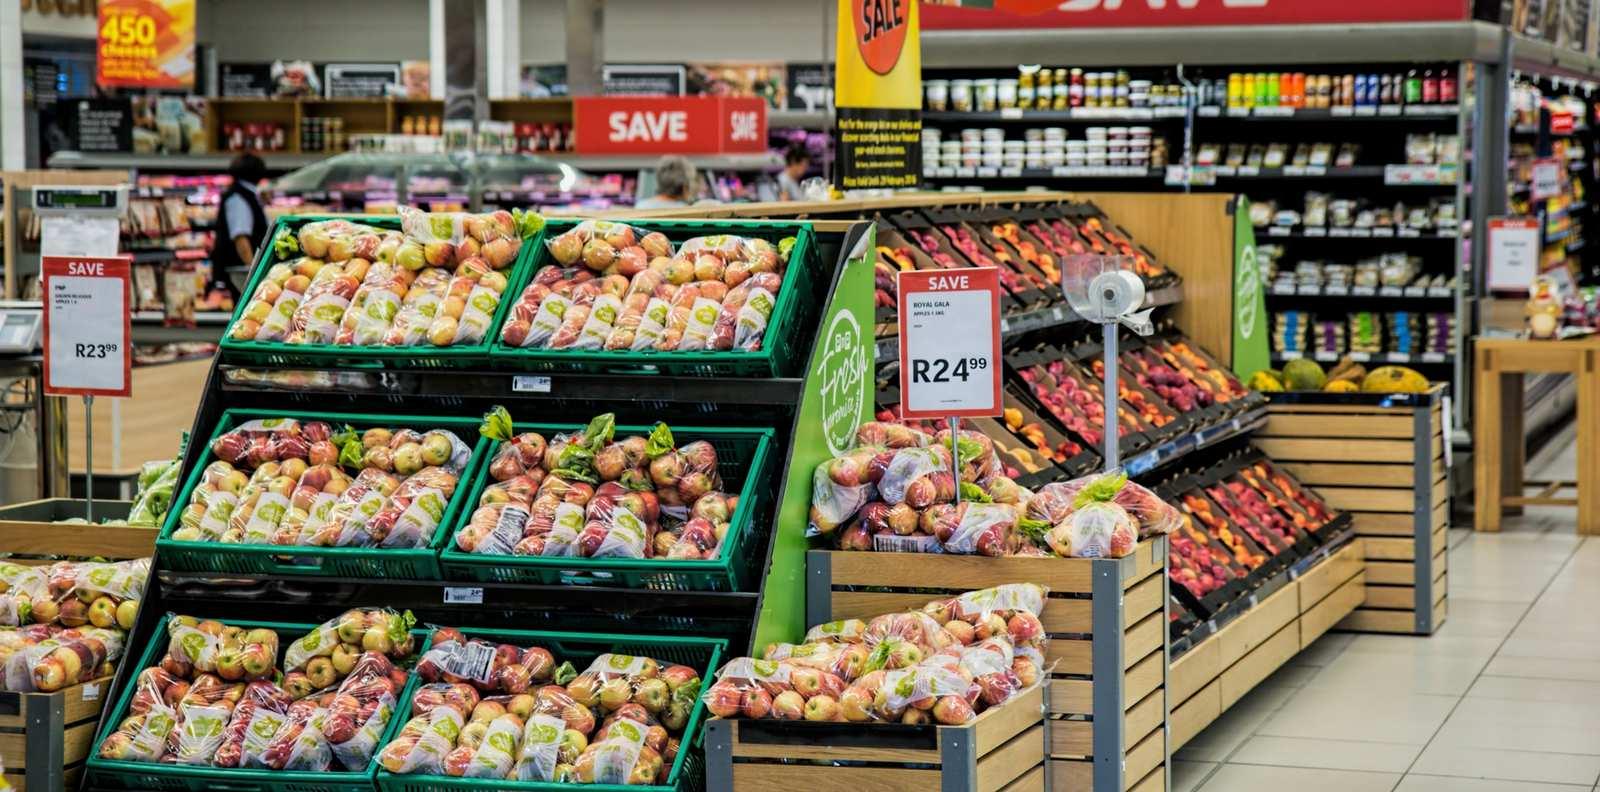 Solutii software complete pentru magazine si supermarket-uri